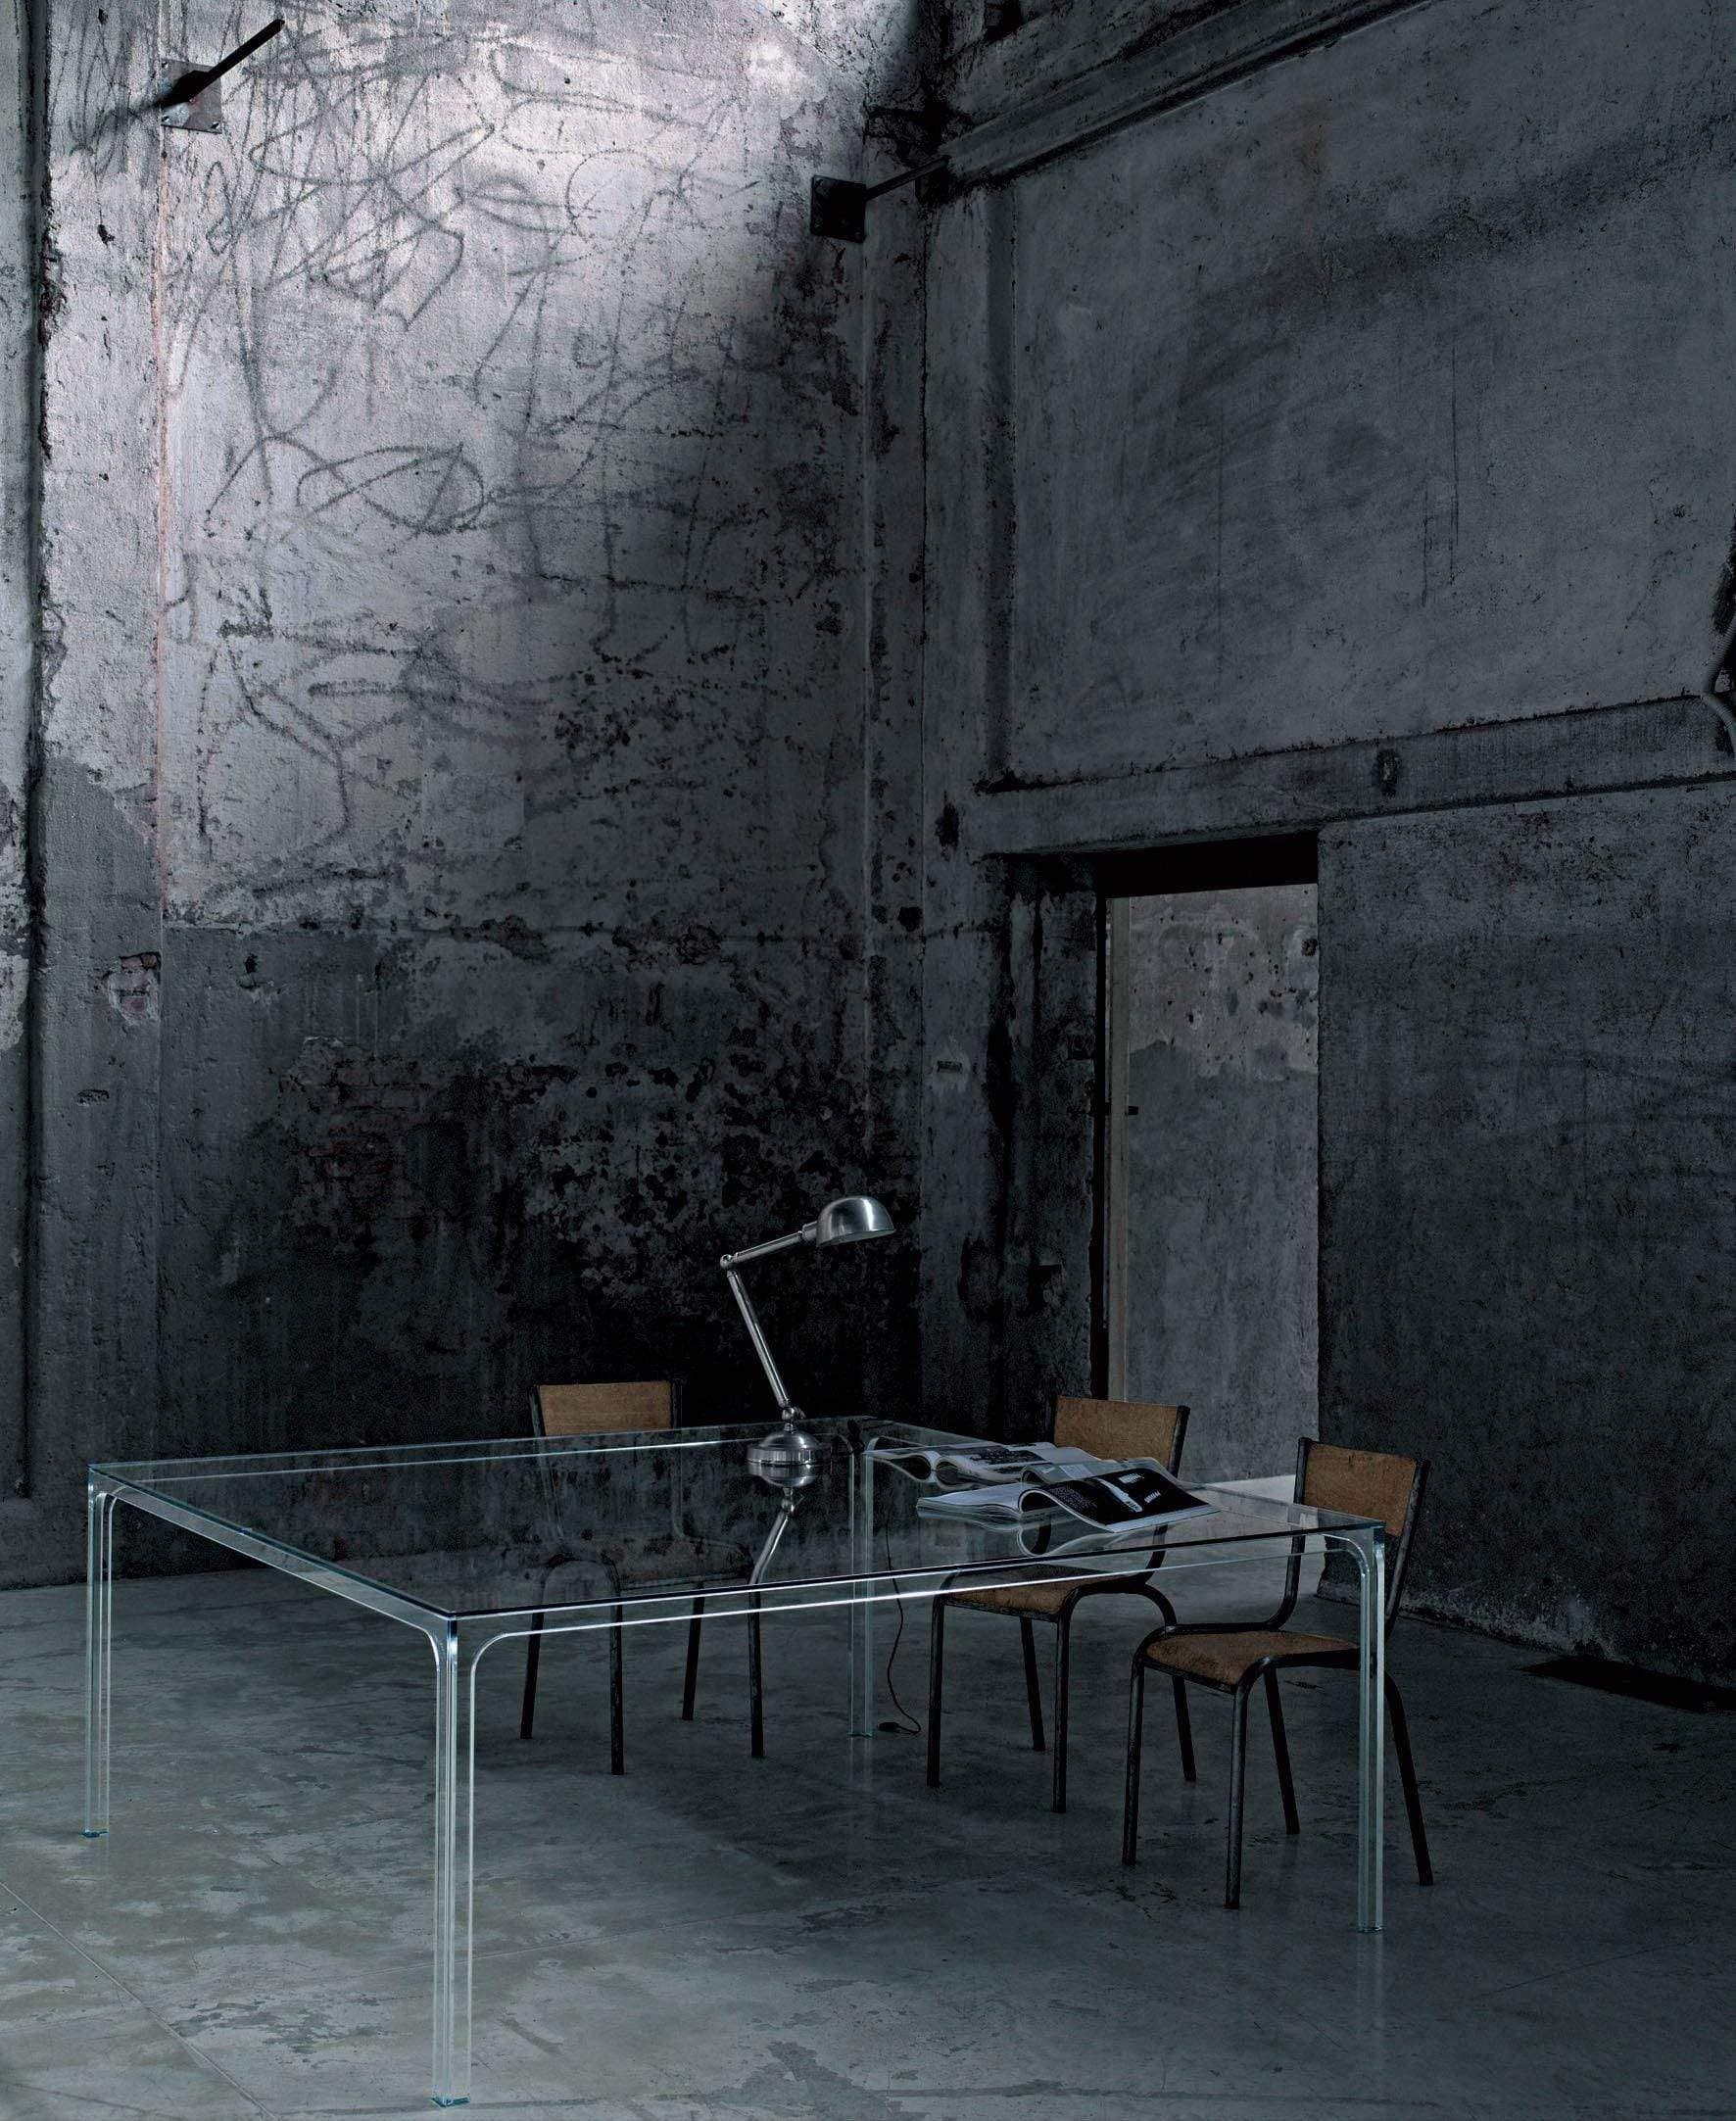 Oscar Writing Desk in 2021 | Glass table, Interior design ...